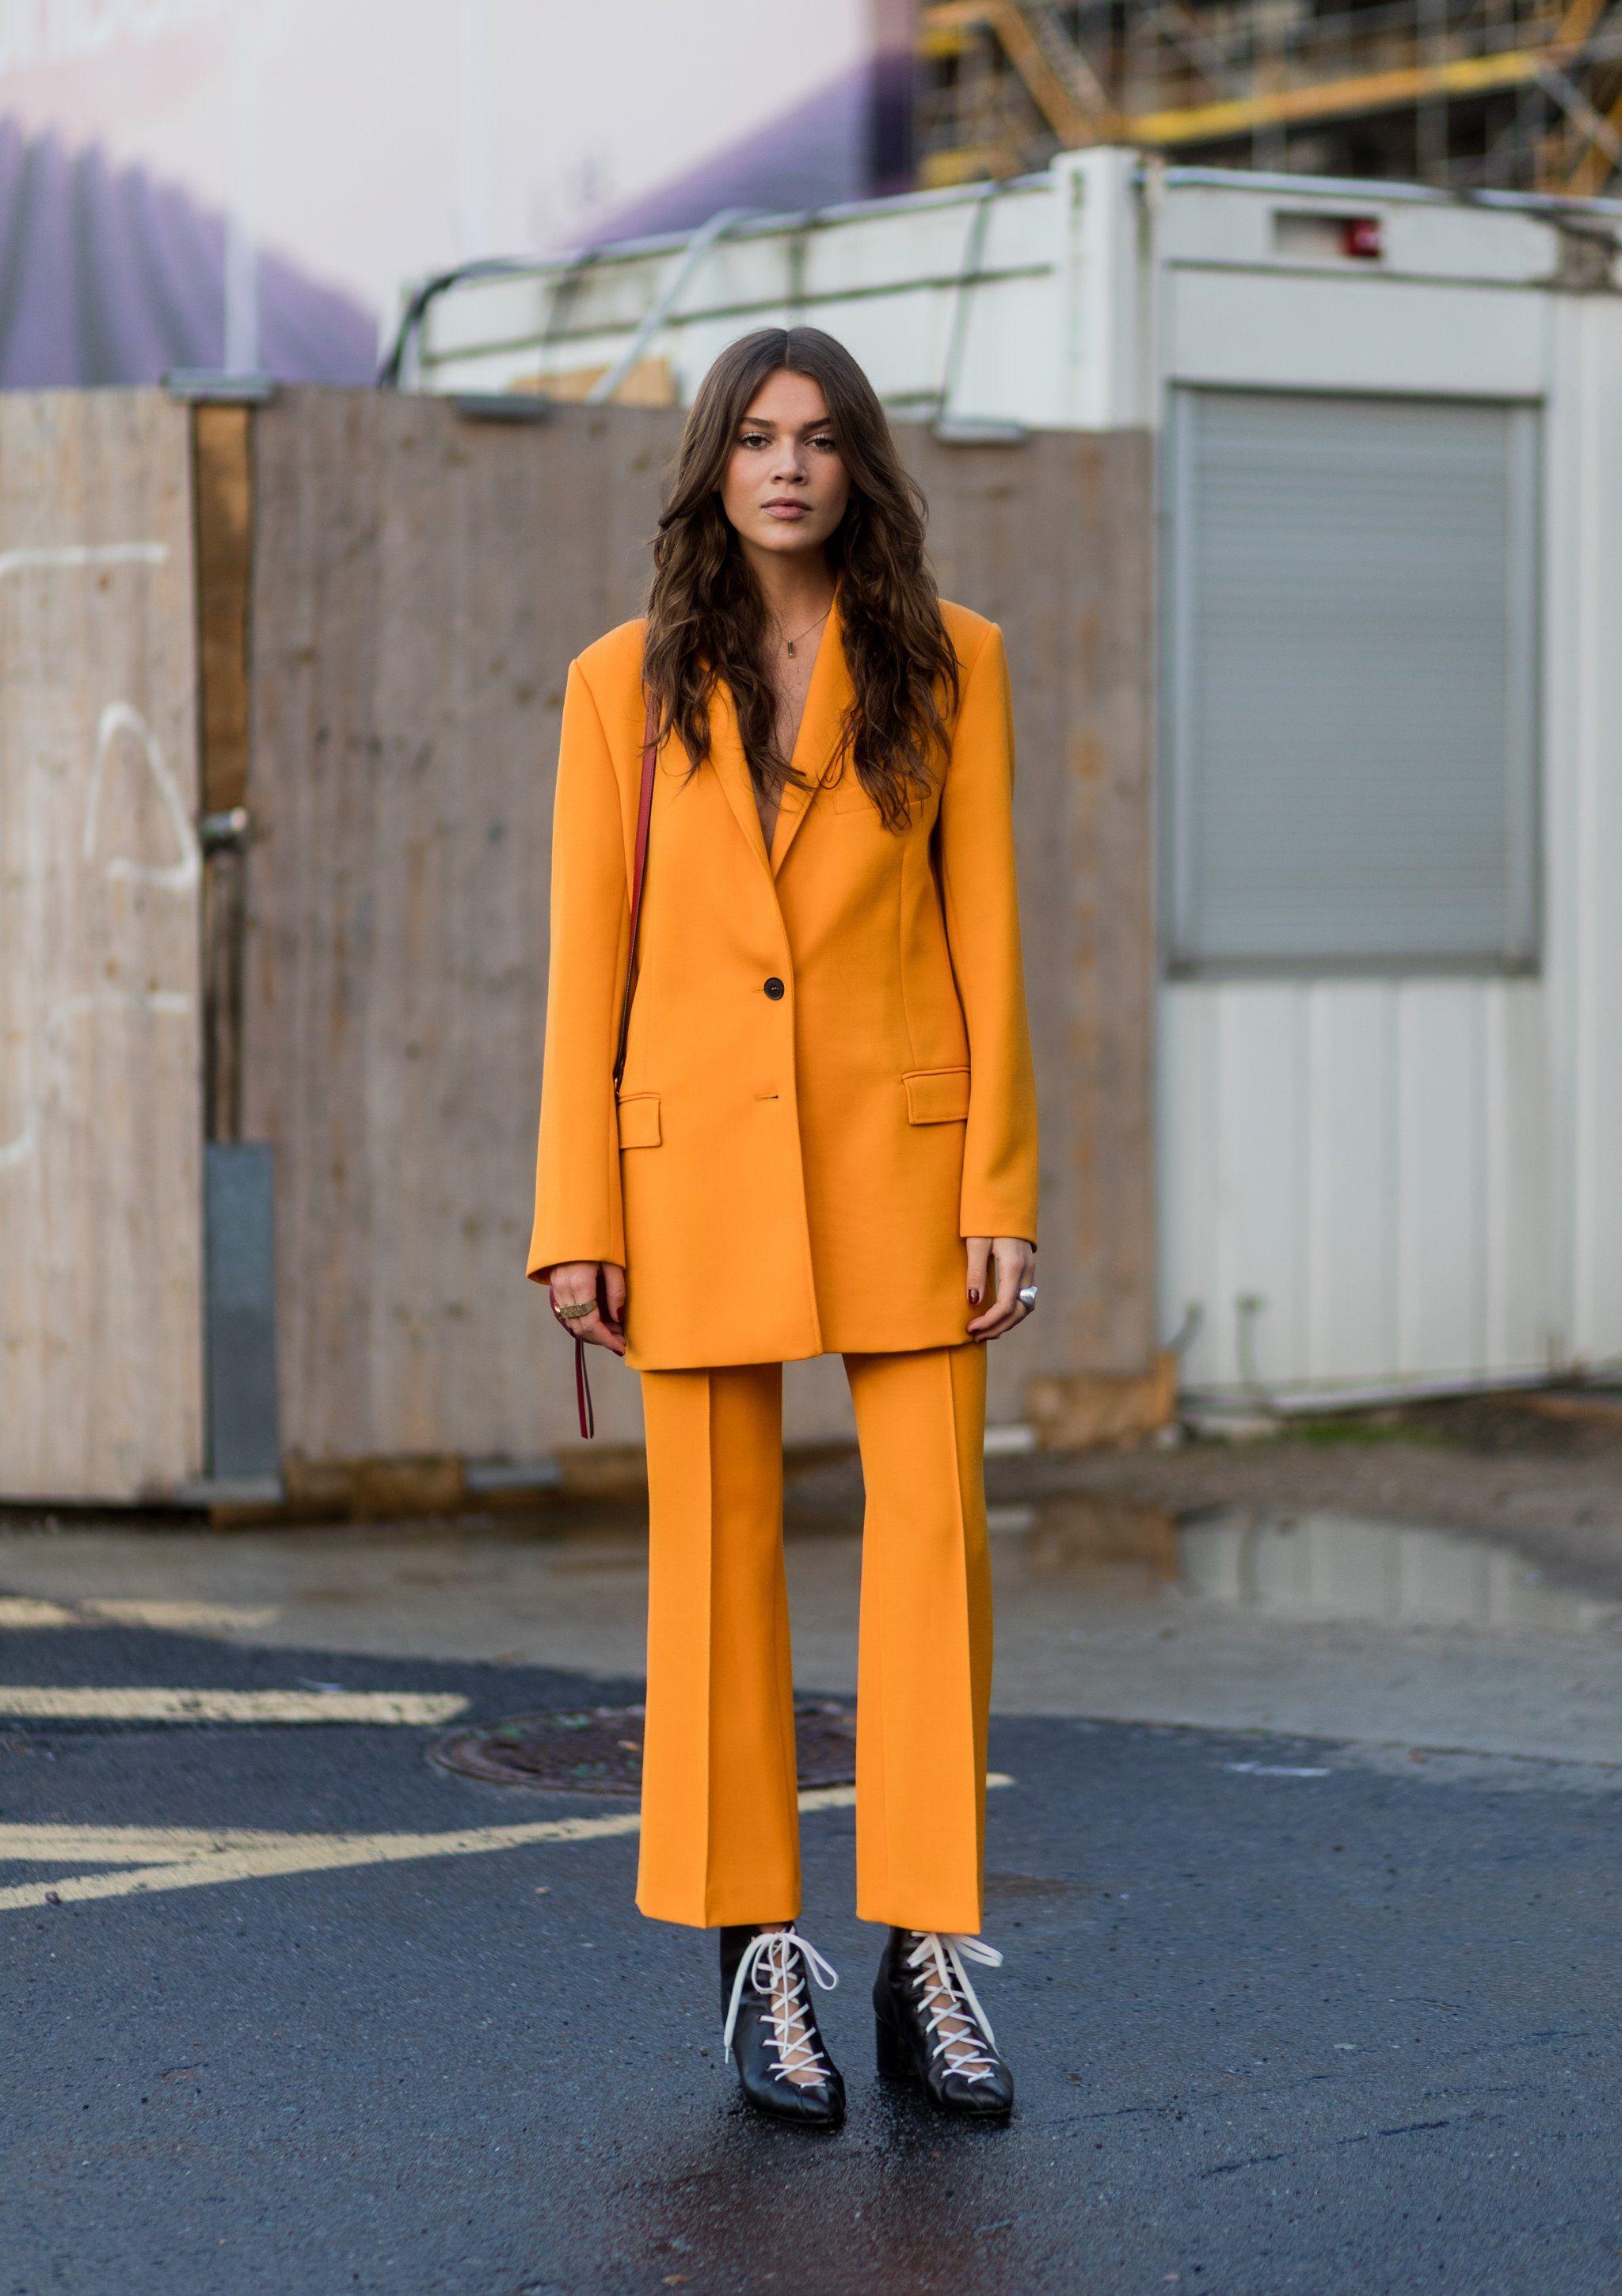 e1fa4691 Tangerine Suit Ladies Trouser Suits, Formal Pant Suits, Yellow Suit, Yellow  Blazer,